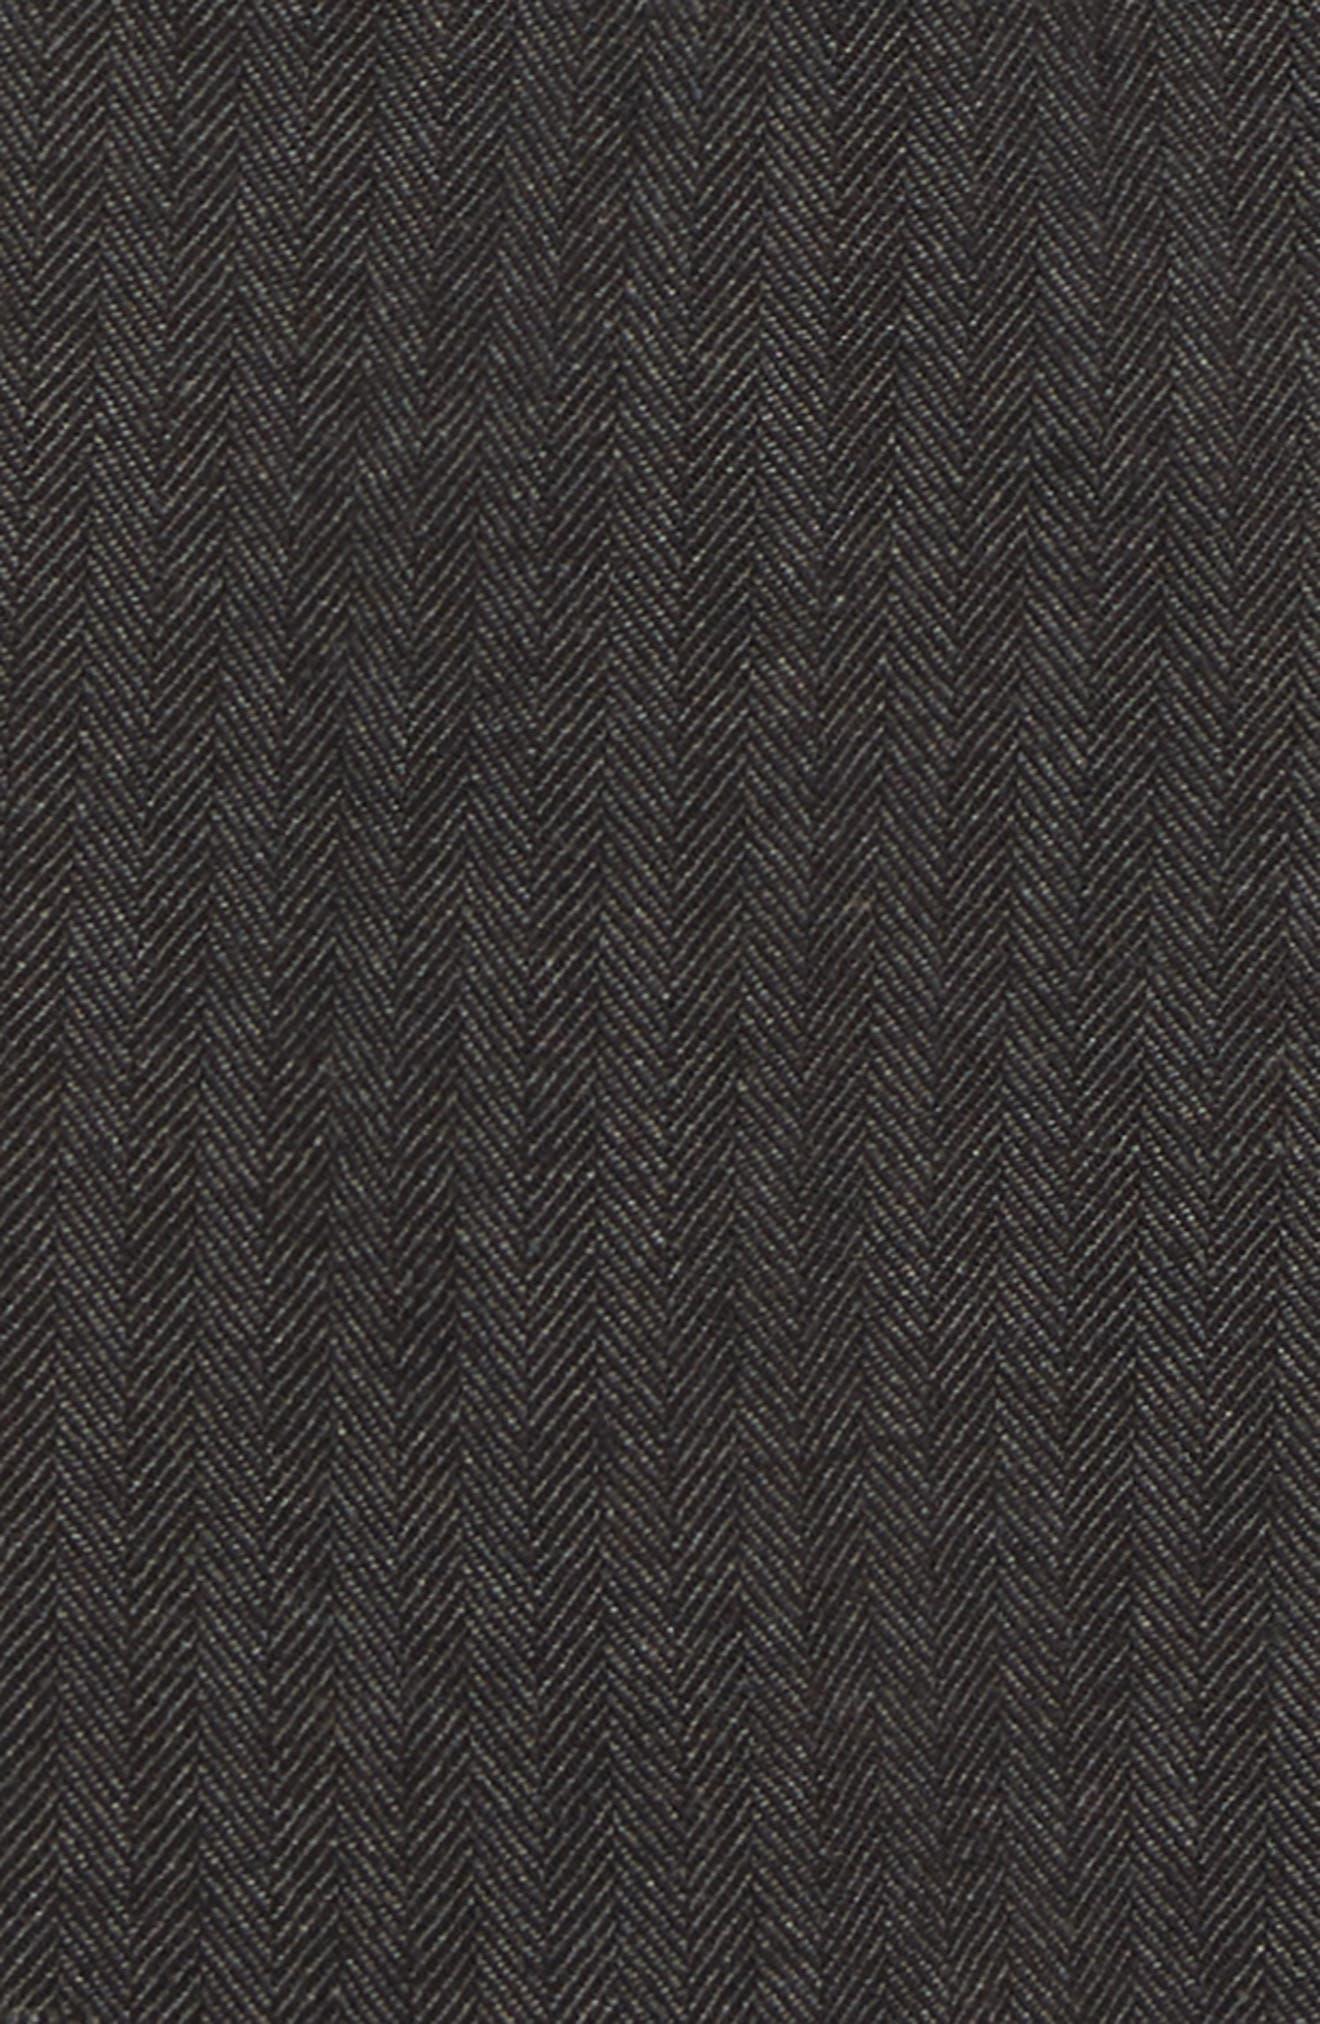 Smart Pull-On Pants,                             Alternate thumbnail 2, color,                             GRY GREY HERRINGBONE